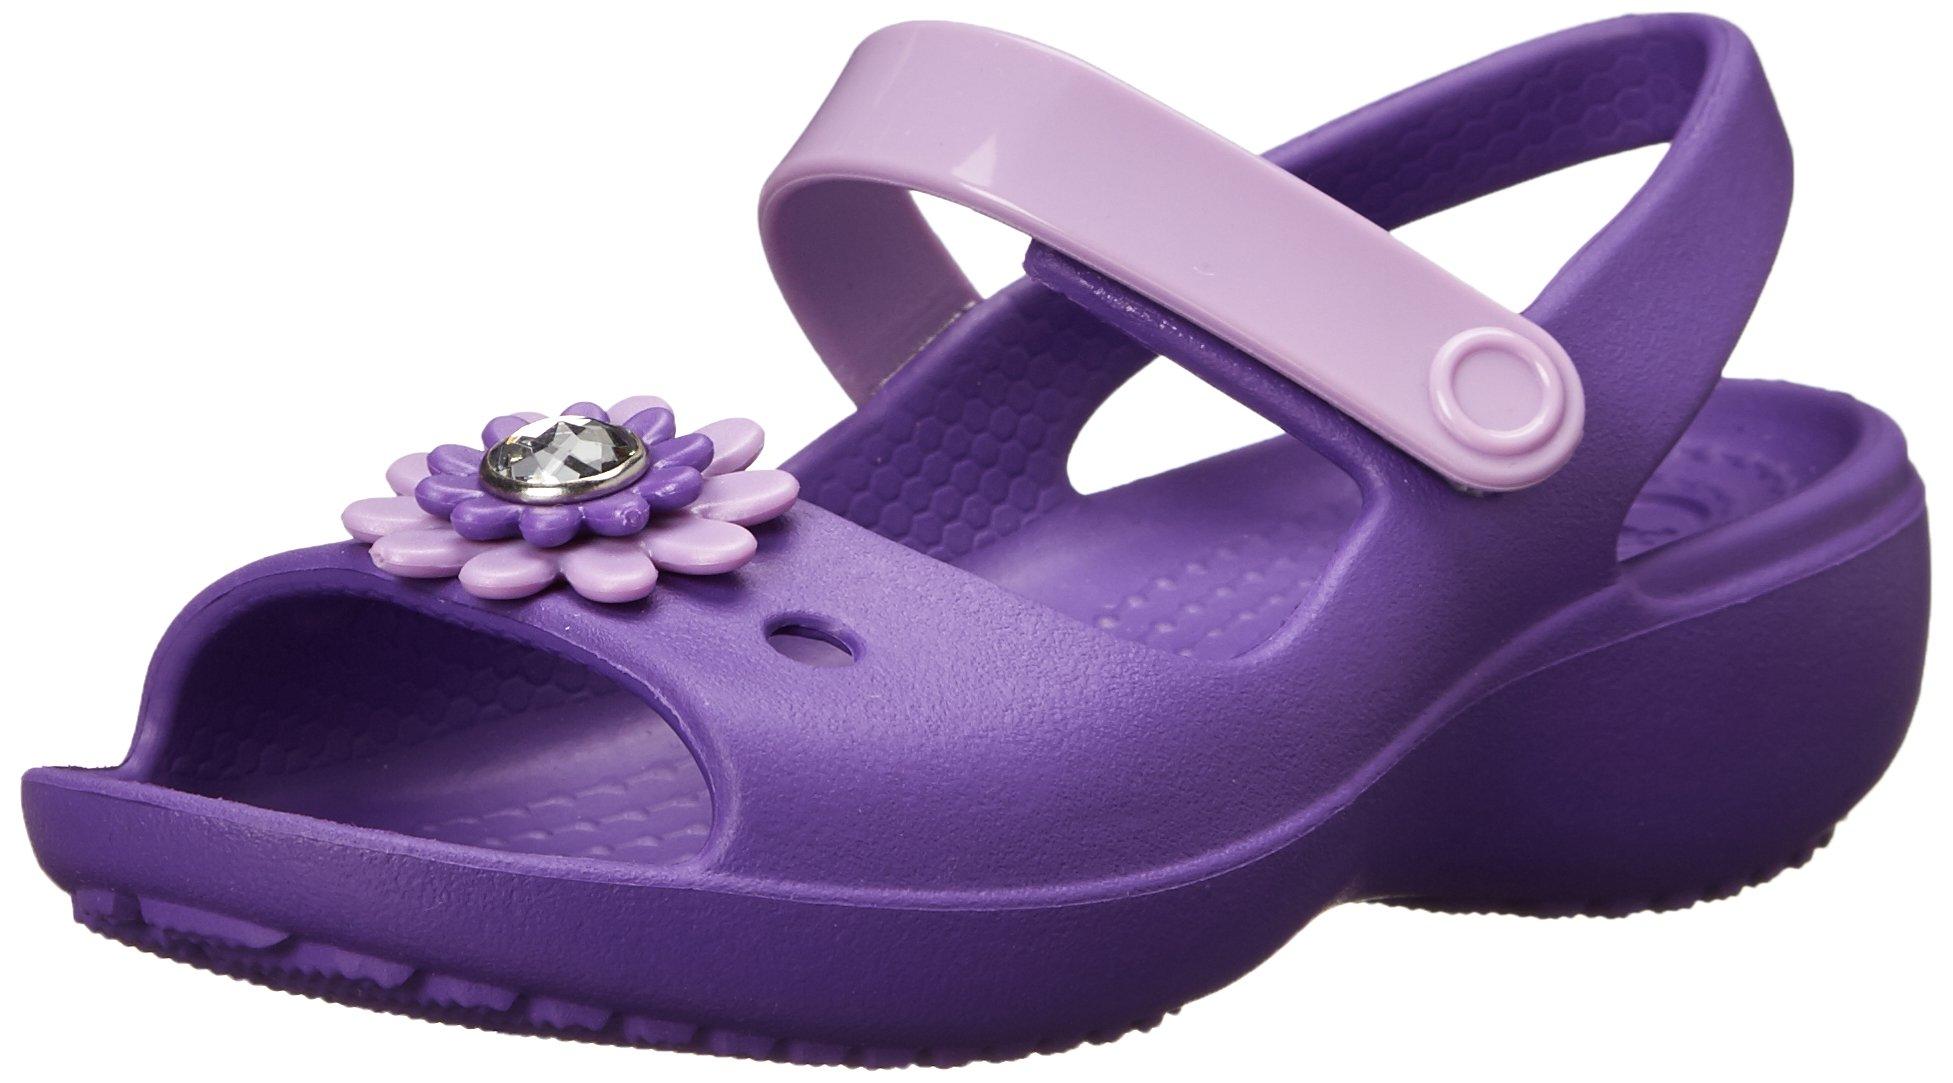 Crocs Keeley Mini Wedge Girls PS Sandal (Toddler/Little Kid),Neon Purple/Iris,12 M US Little Kid